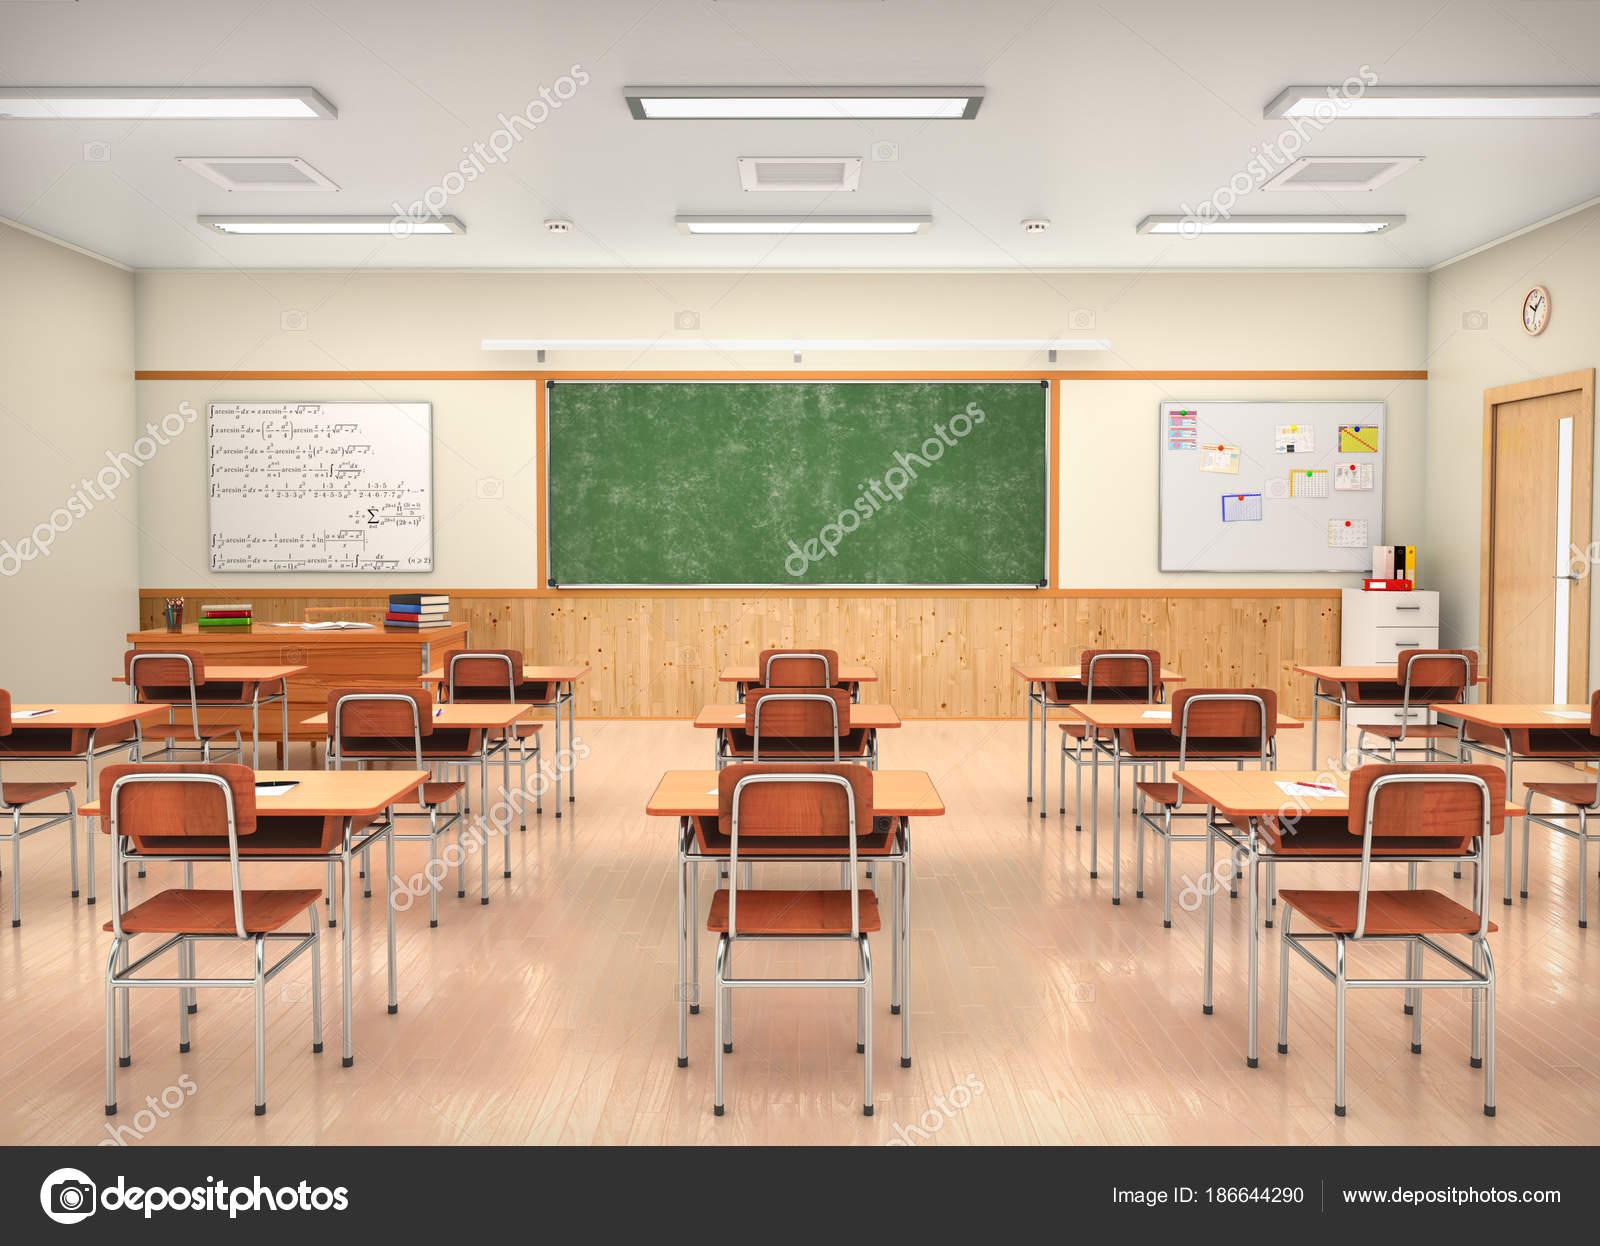 Classroom Interior Design Ideas School Classroom Interior 3d Illustration Stock Photo C Urfingus 186644290